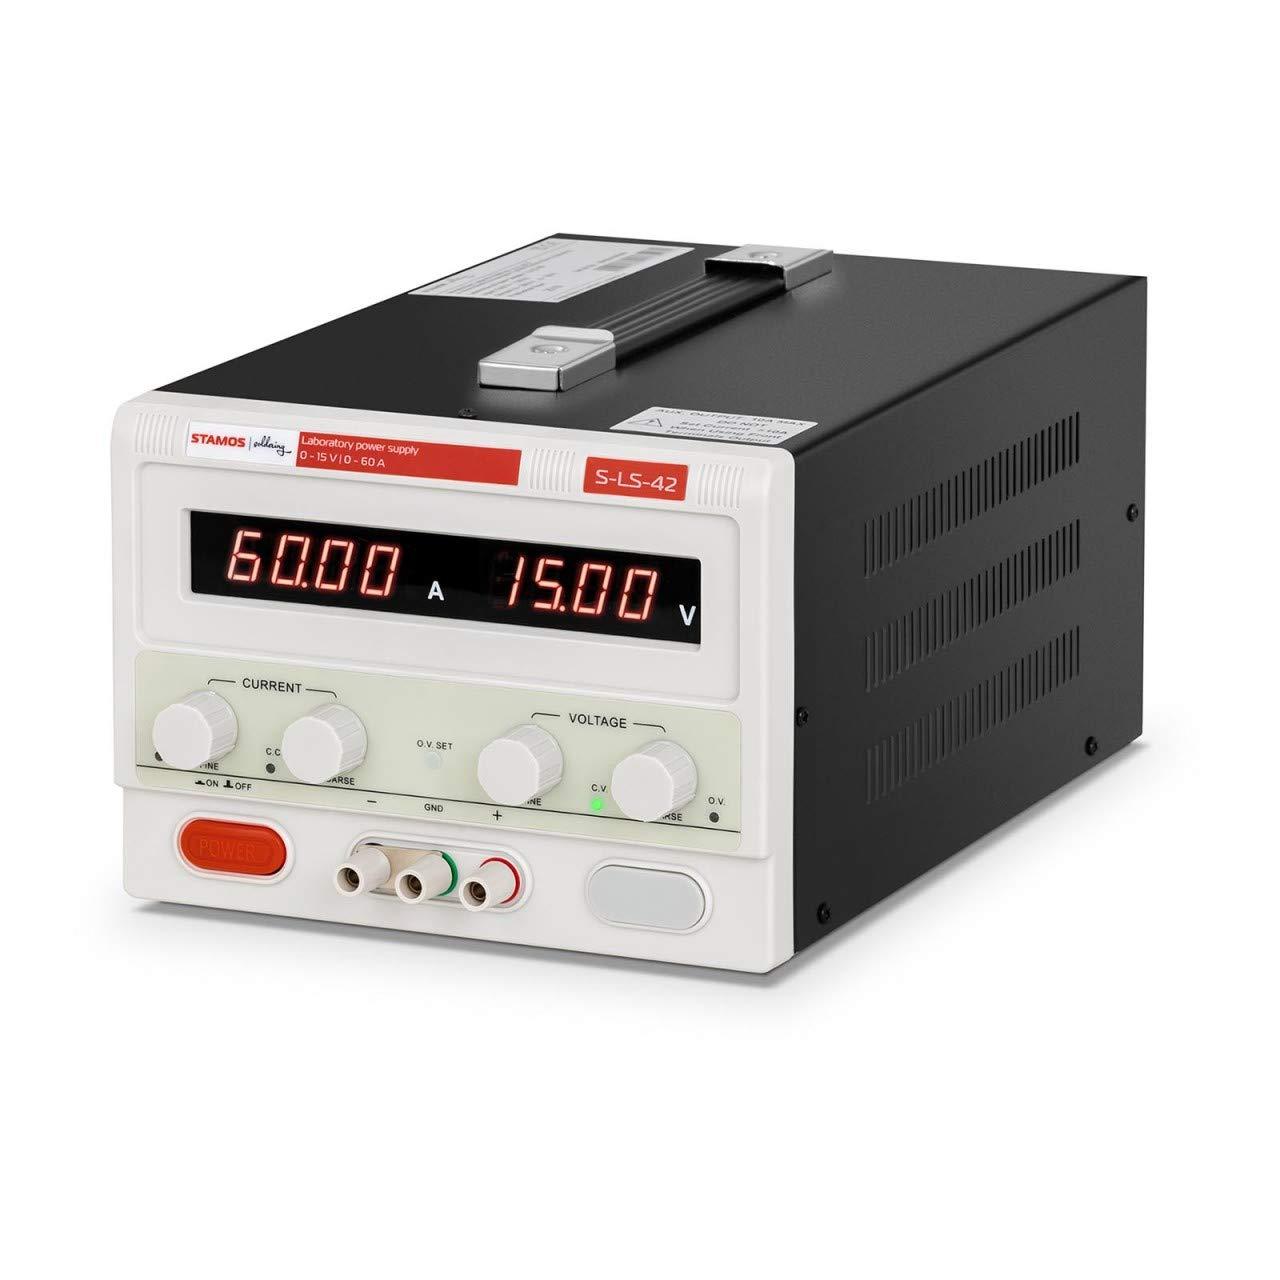 0-30 V, 0-30 A DC, 900 W, Baja ondulaci/ón residual Stamos Soldering Fuente De Alimentaci/ón Para Laboratorio Alimentador Regulable S-LS-78